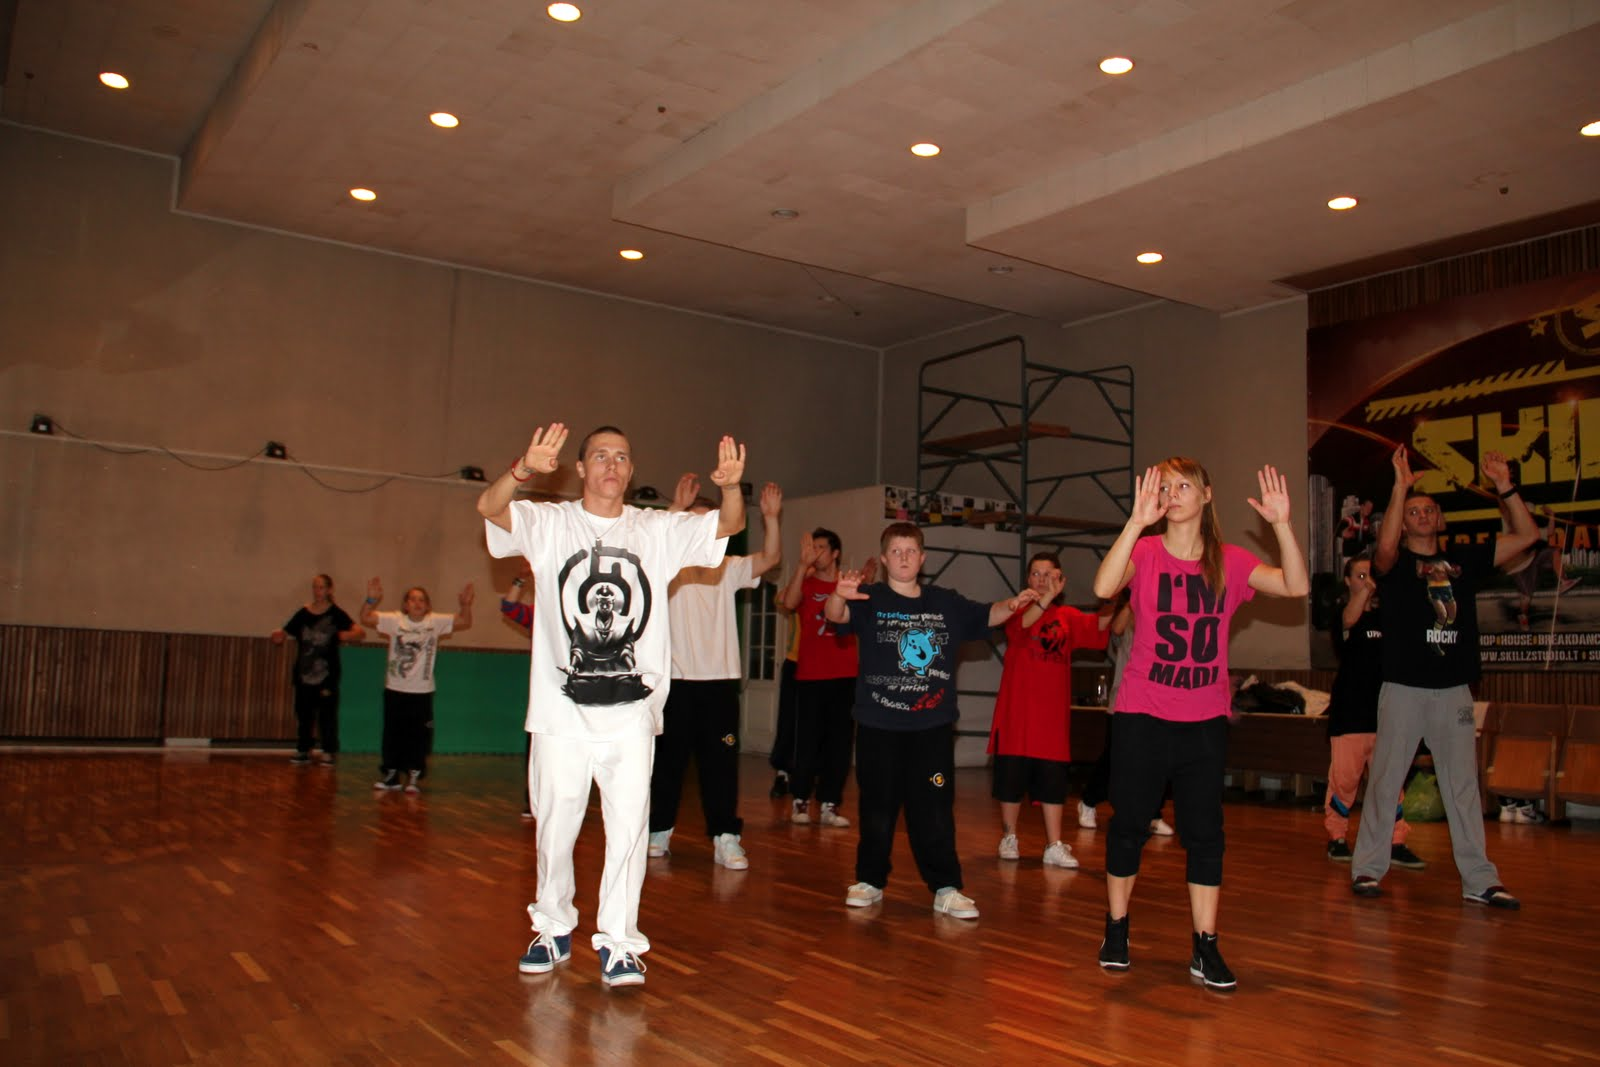 Dre10 Workshop @SKILLZ - IMG_5699.JPG